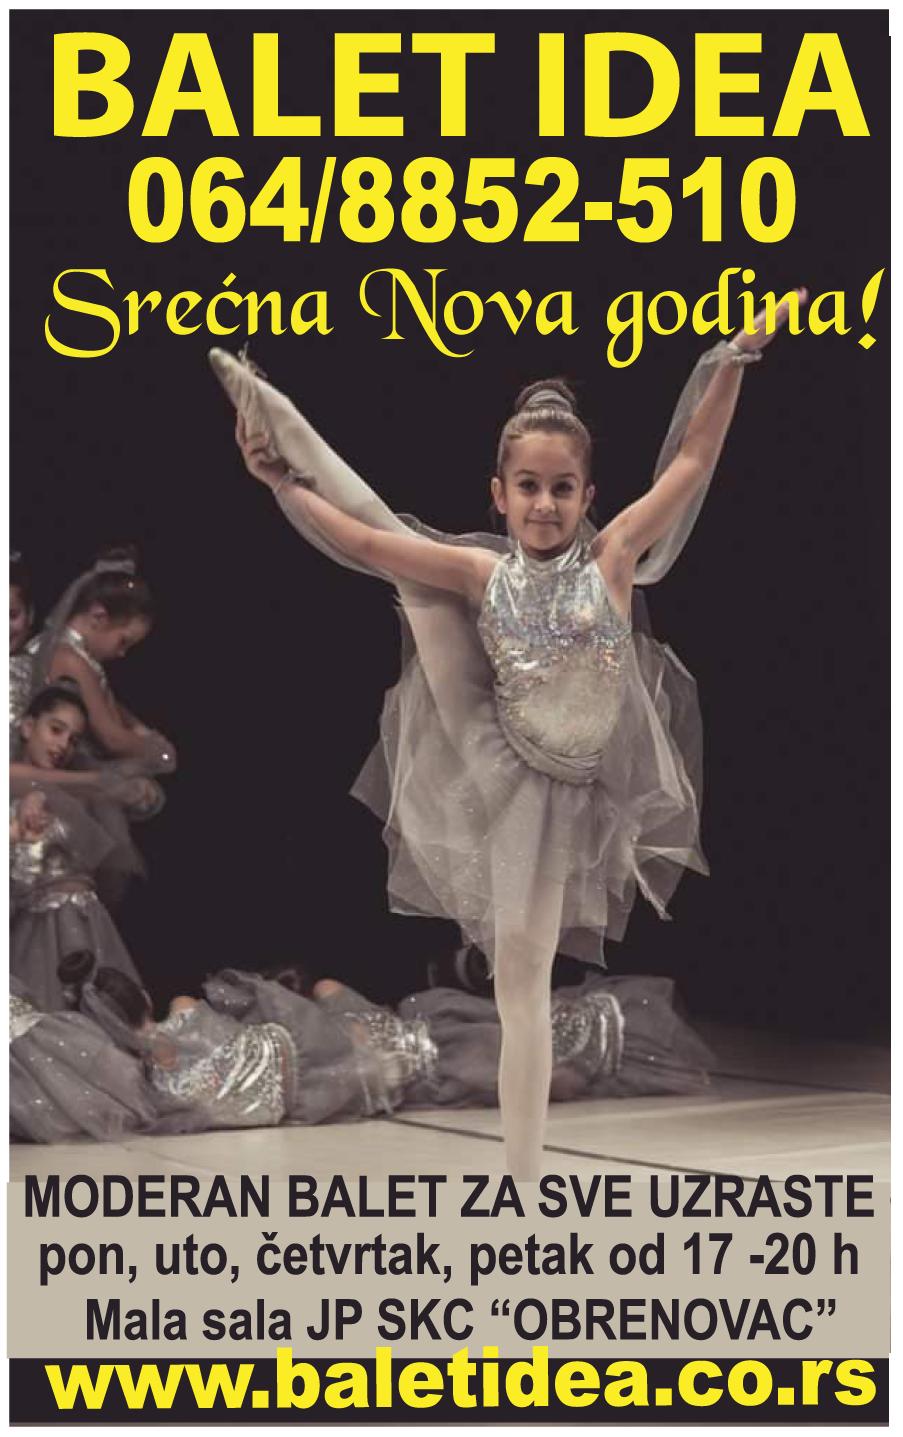 balet-idea-obrenovac-skolice-balerina-baletanke-casovi-dom-kulture-prirpedbe-devojcice-svecano-lephod-pravilan-razvoj-kicma-mojabaza